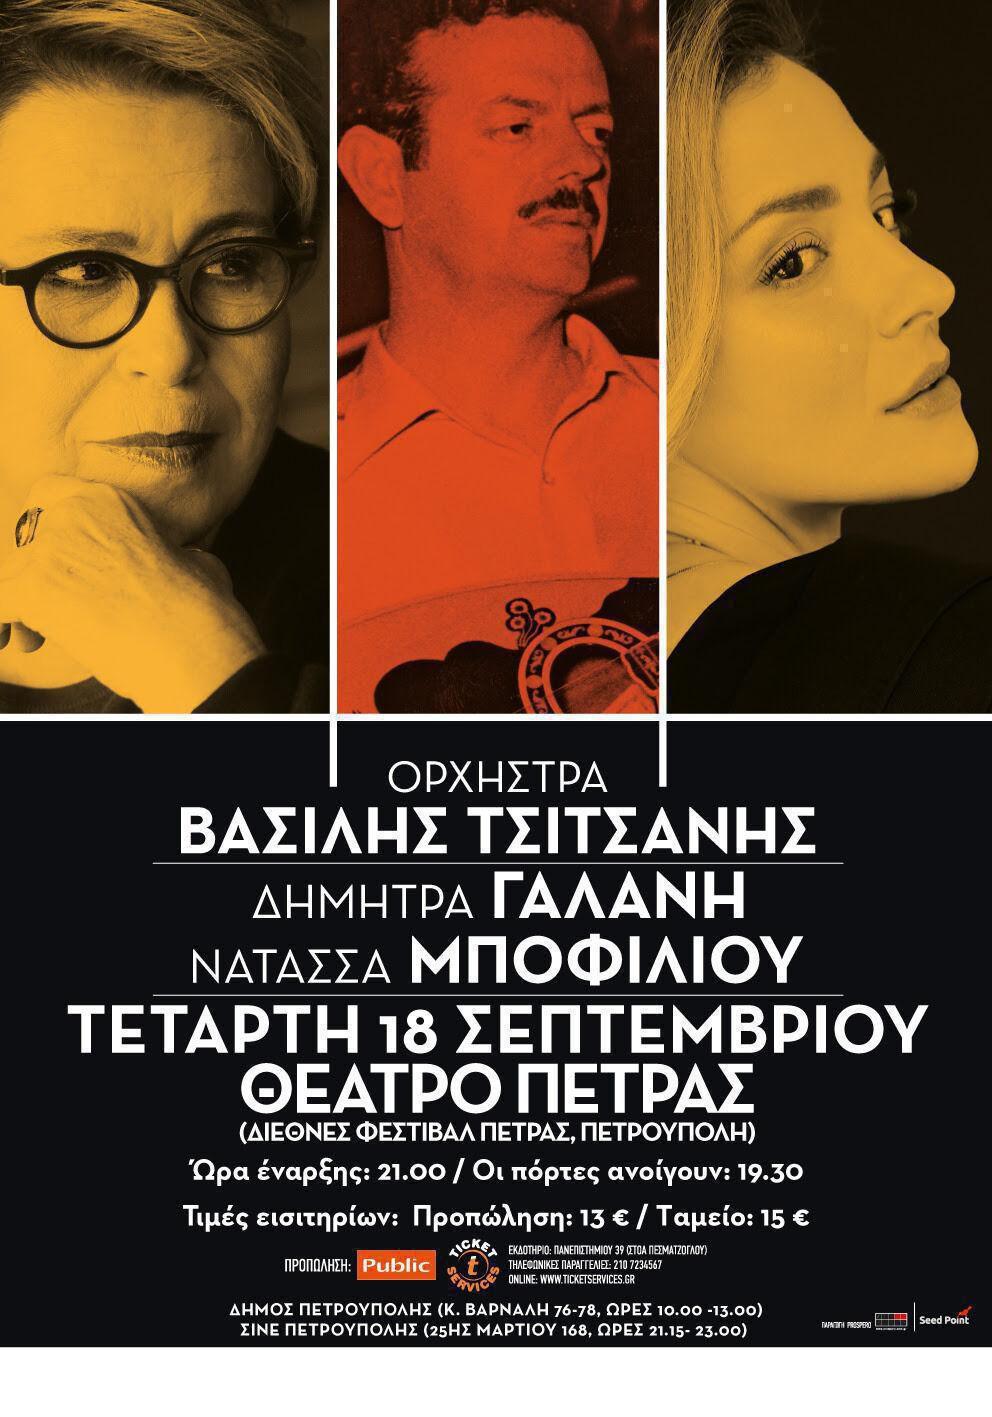 Orxhstra Tsitsanis